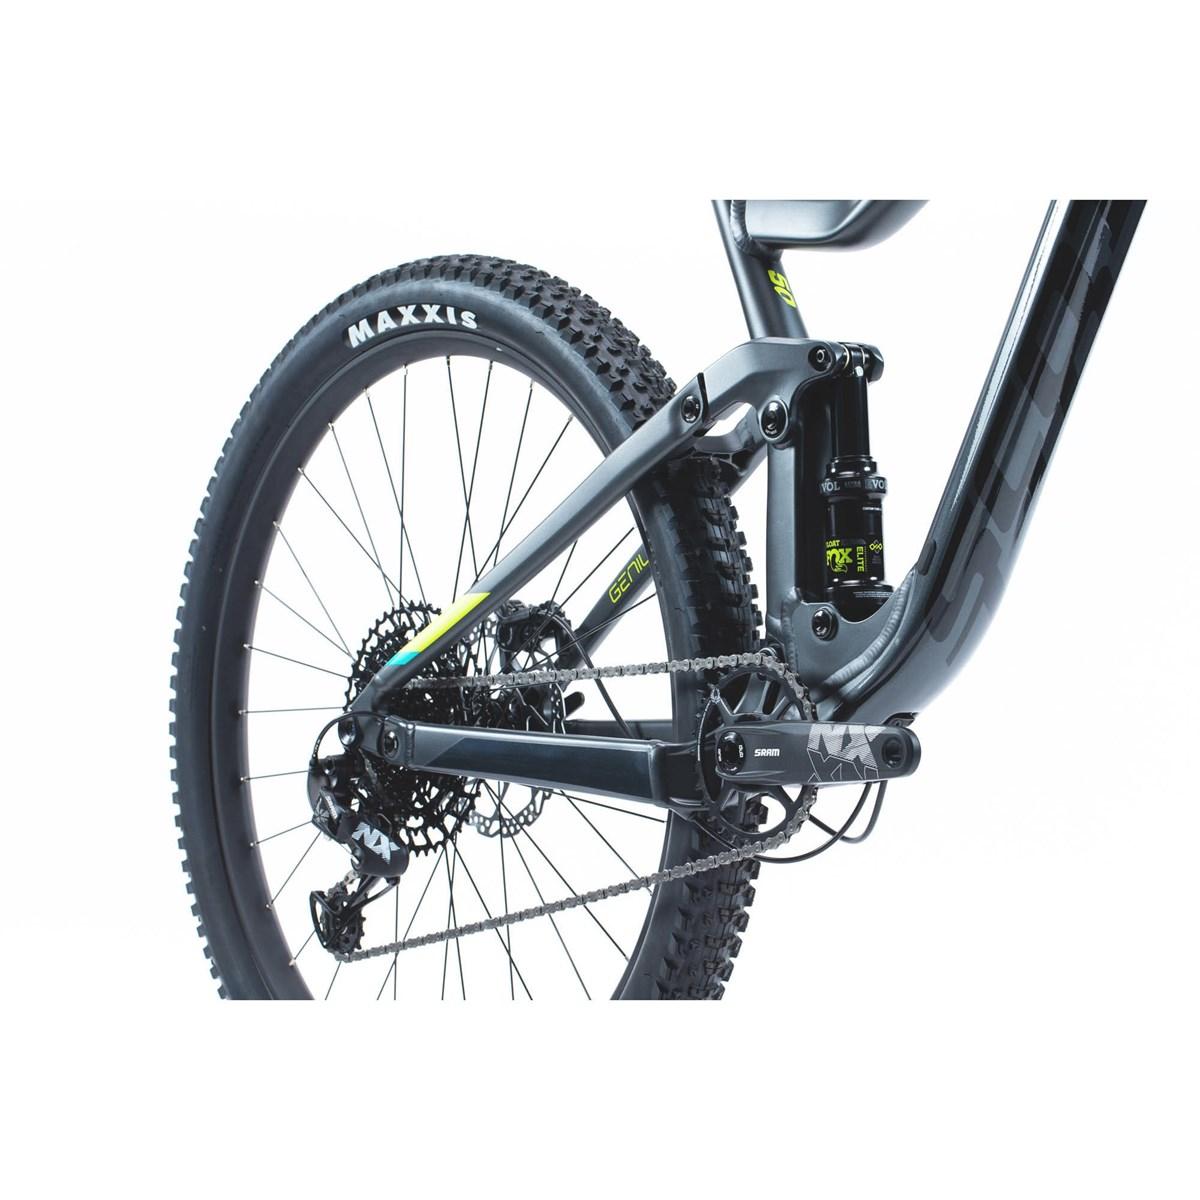 Fair Trading Licence Check >> 2019 Scott Genius 950 Full Suspension Mountain Bike £2,024.25